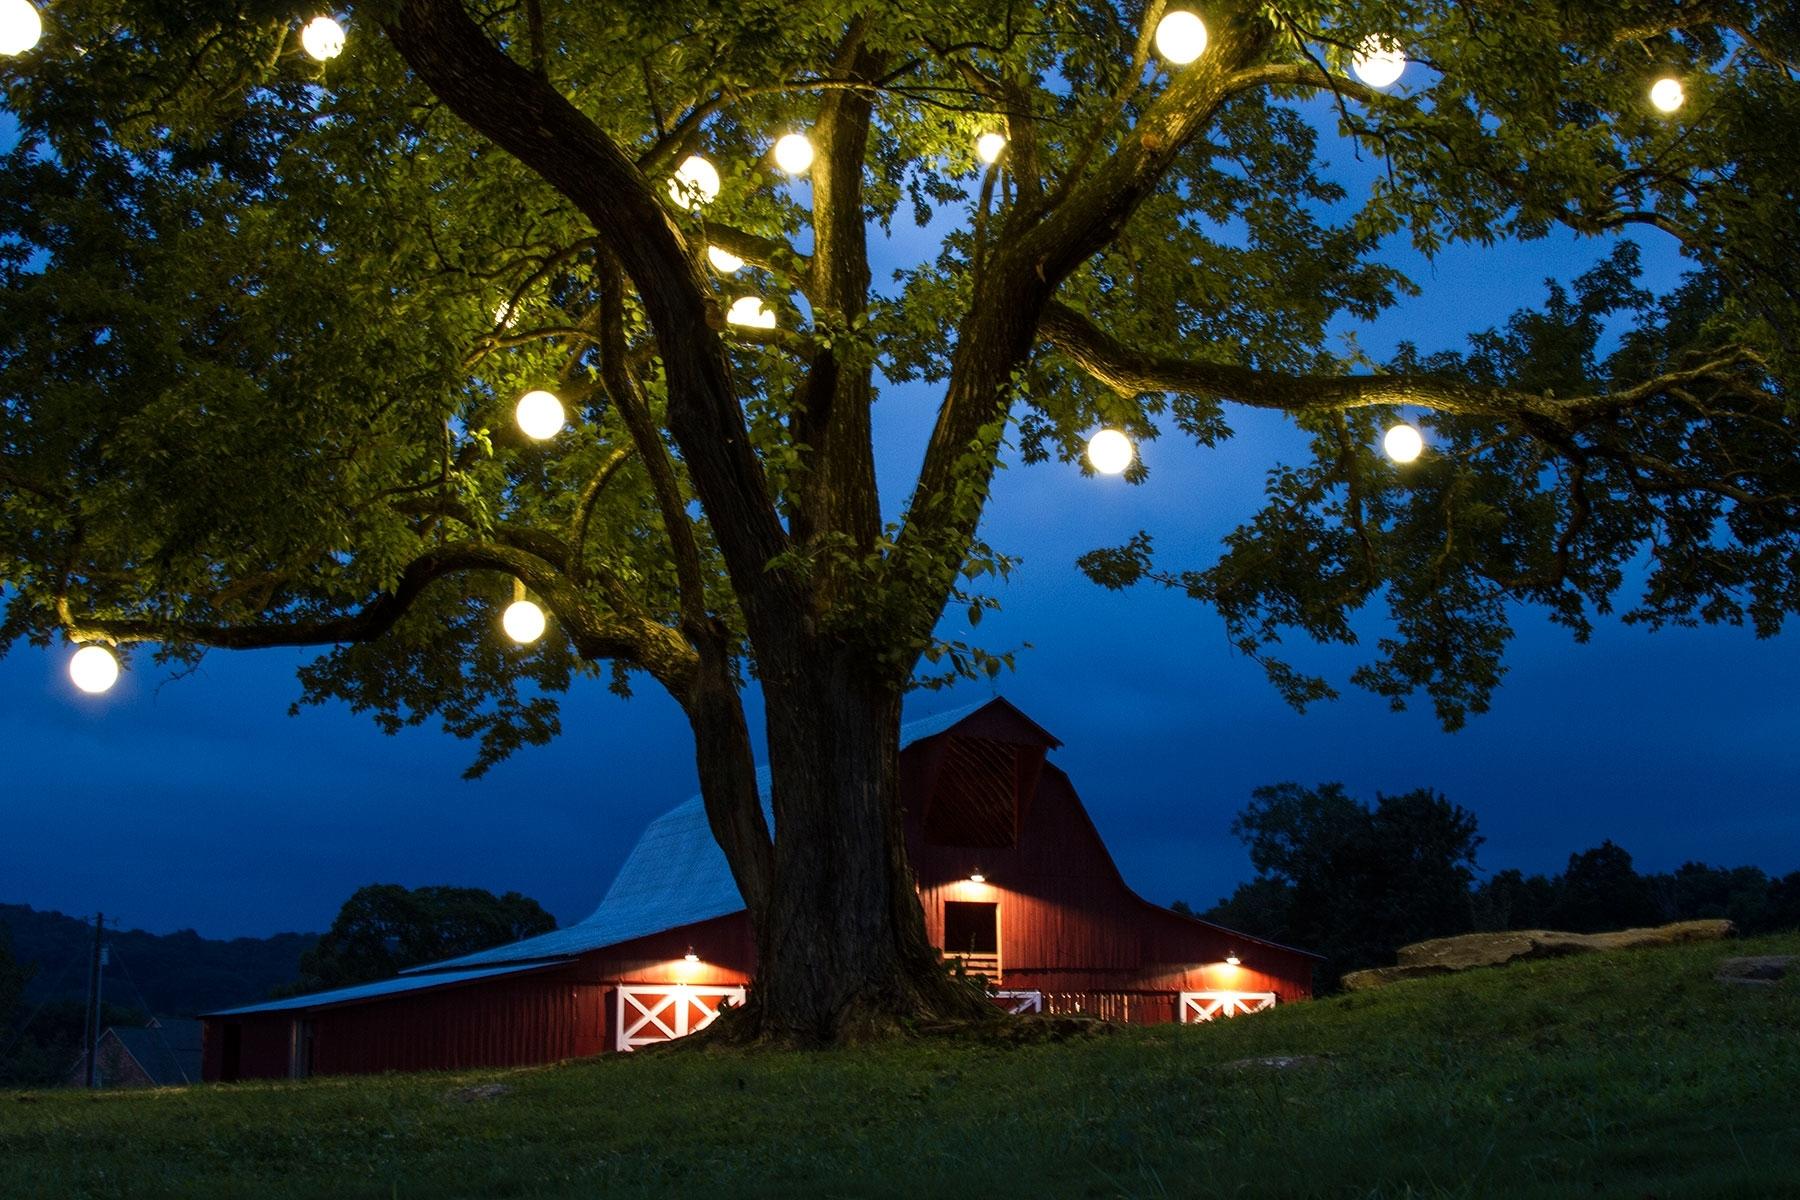 Oksunglassesn Pertaining To Latest Outdoor Hanging Tree Lanterns (View 14 of 20)